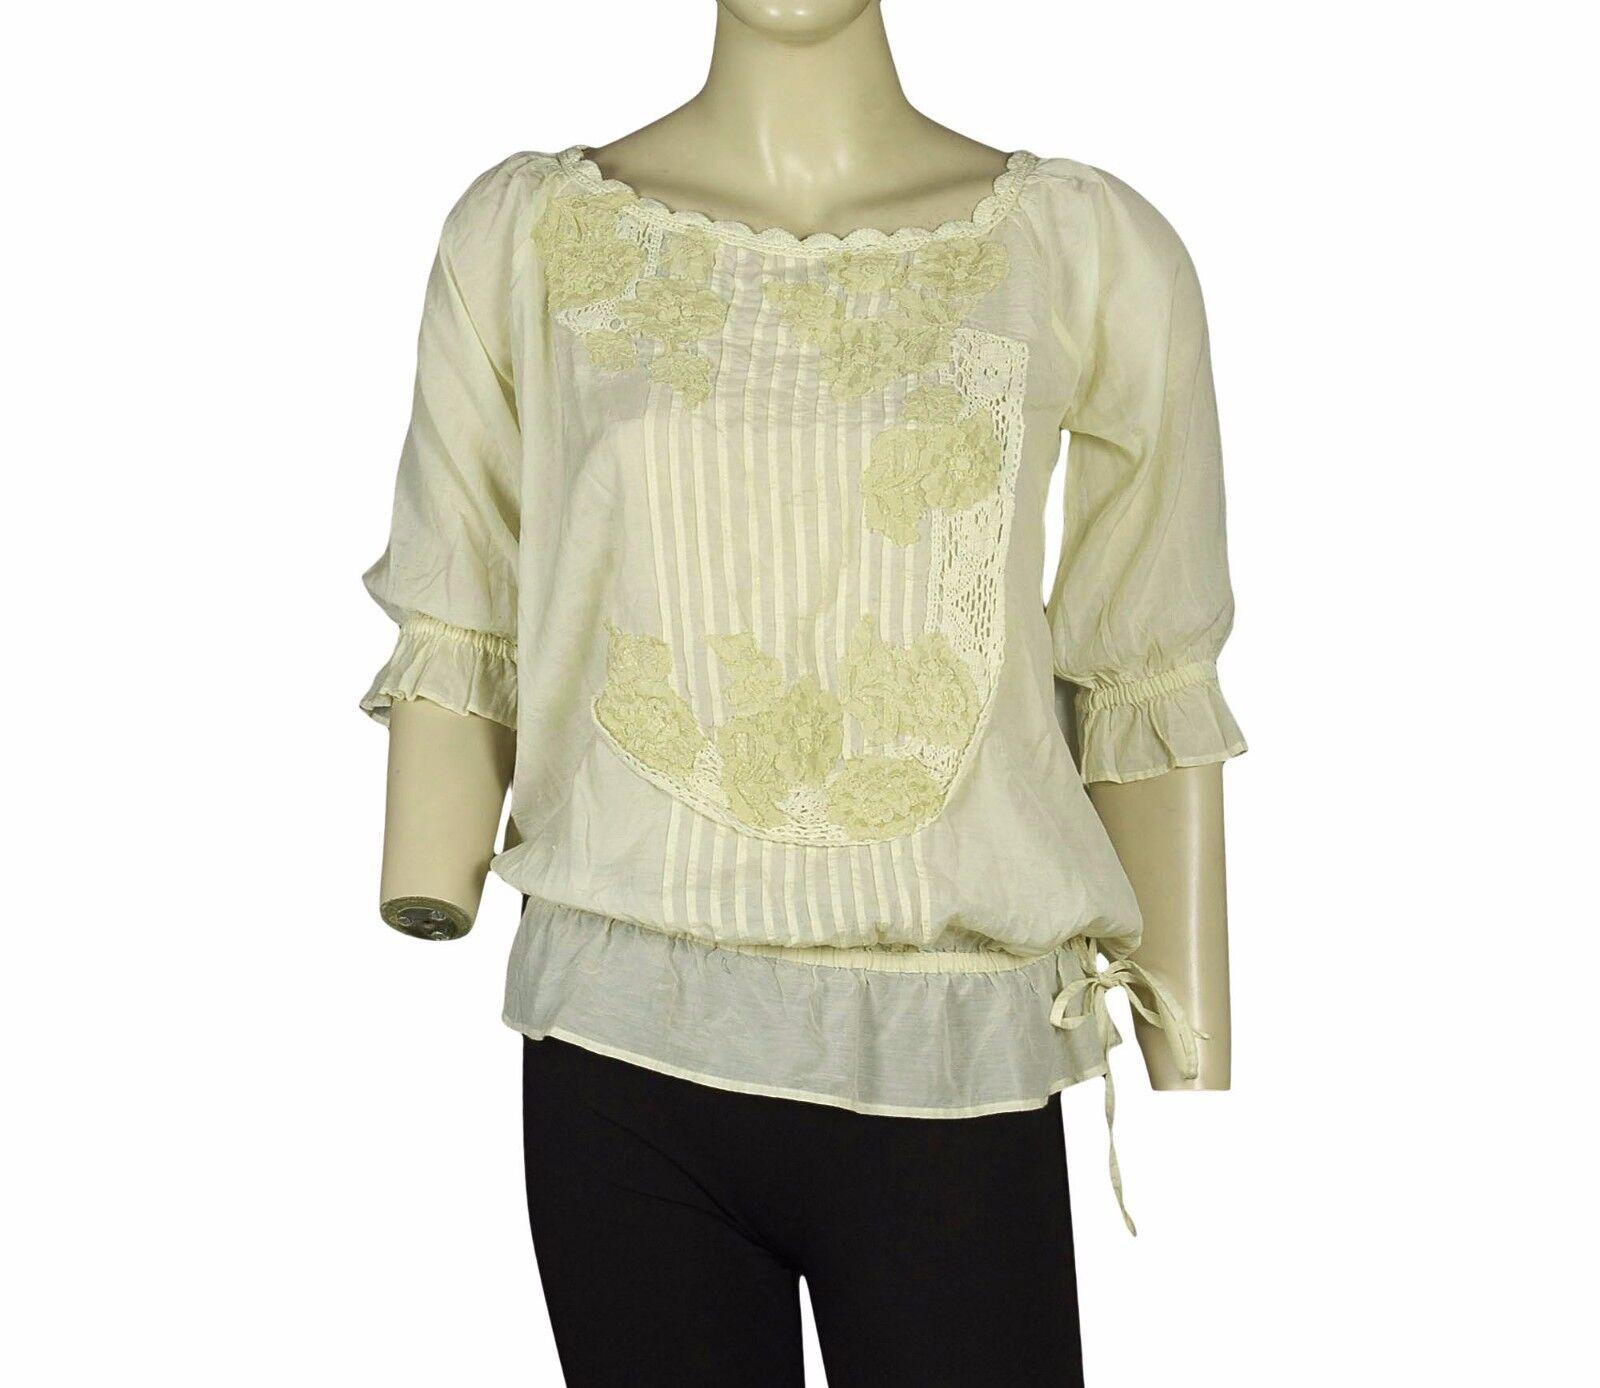 2584 New Twin Set Simona Barbieri Embroidered Beige Cotton Blouse Tunic Top XS